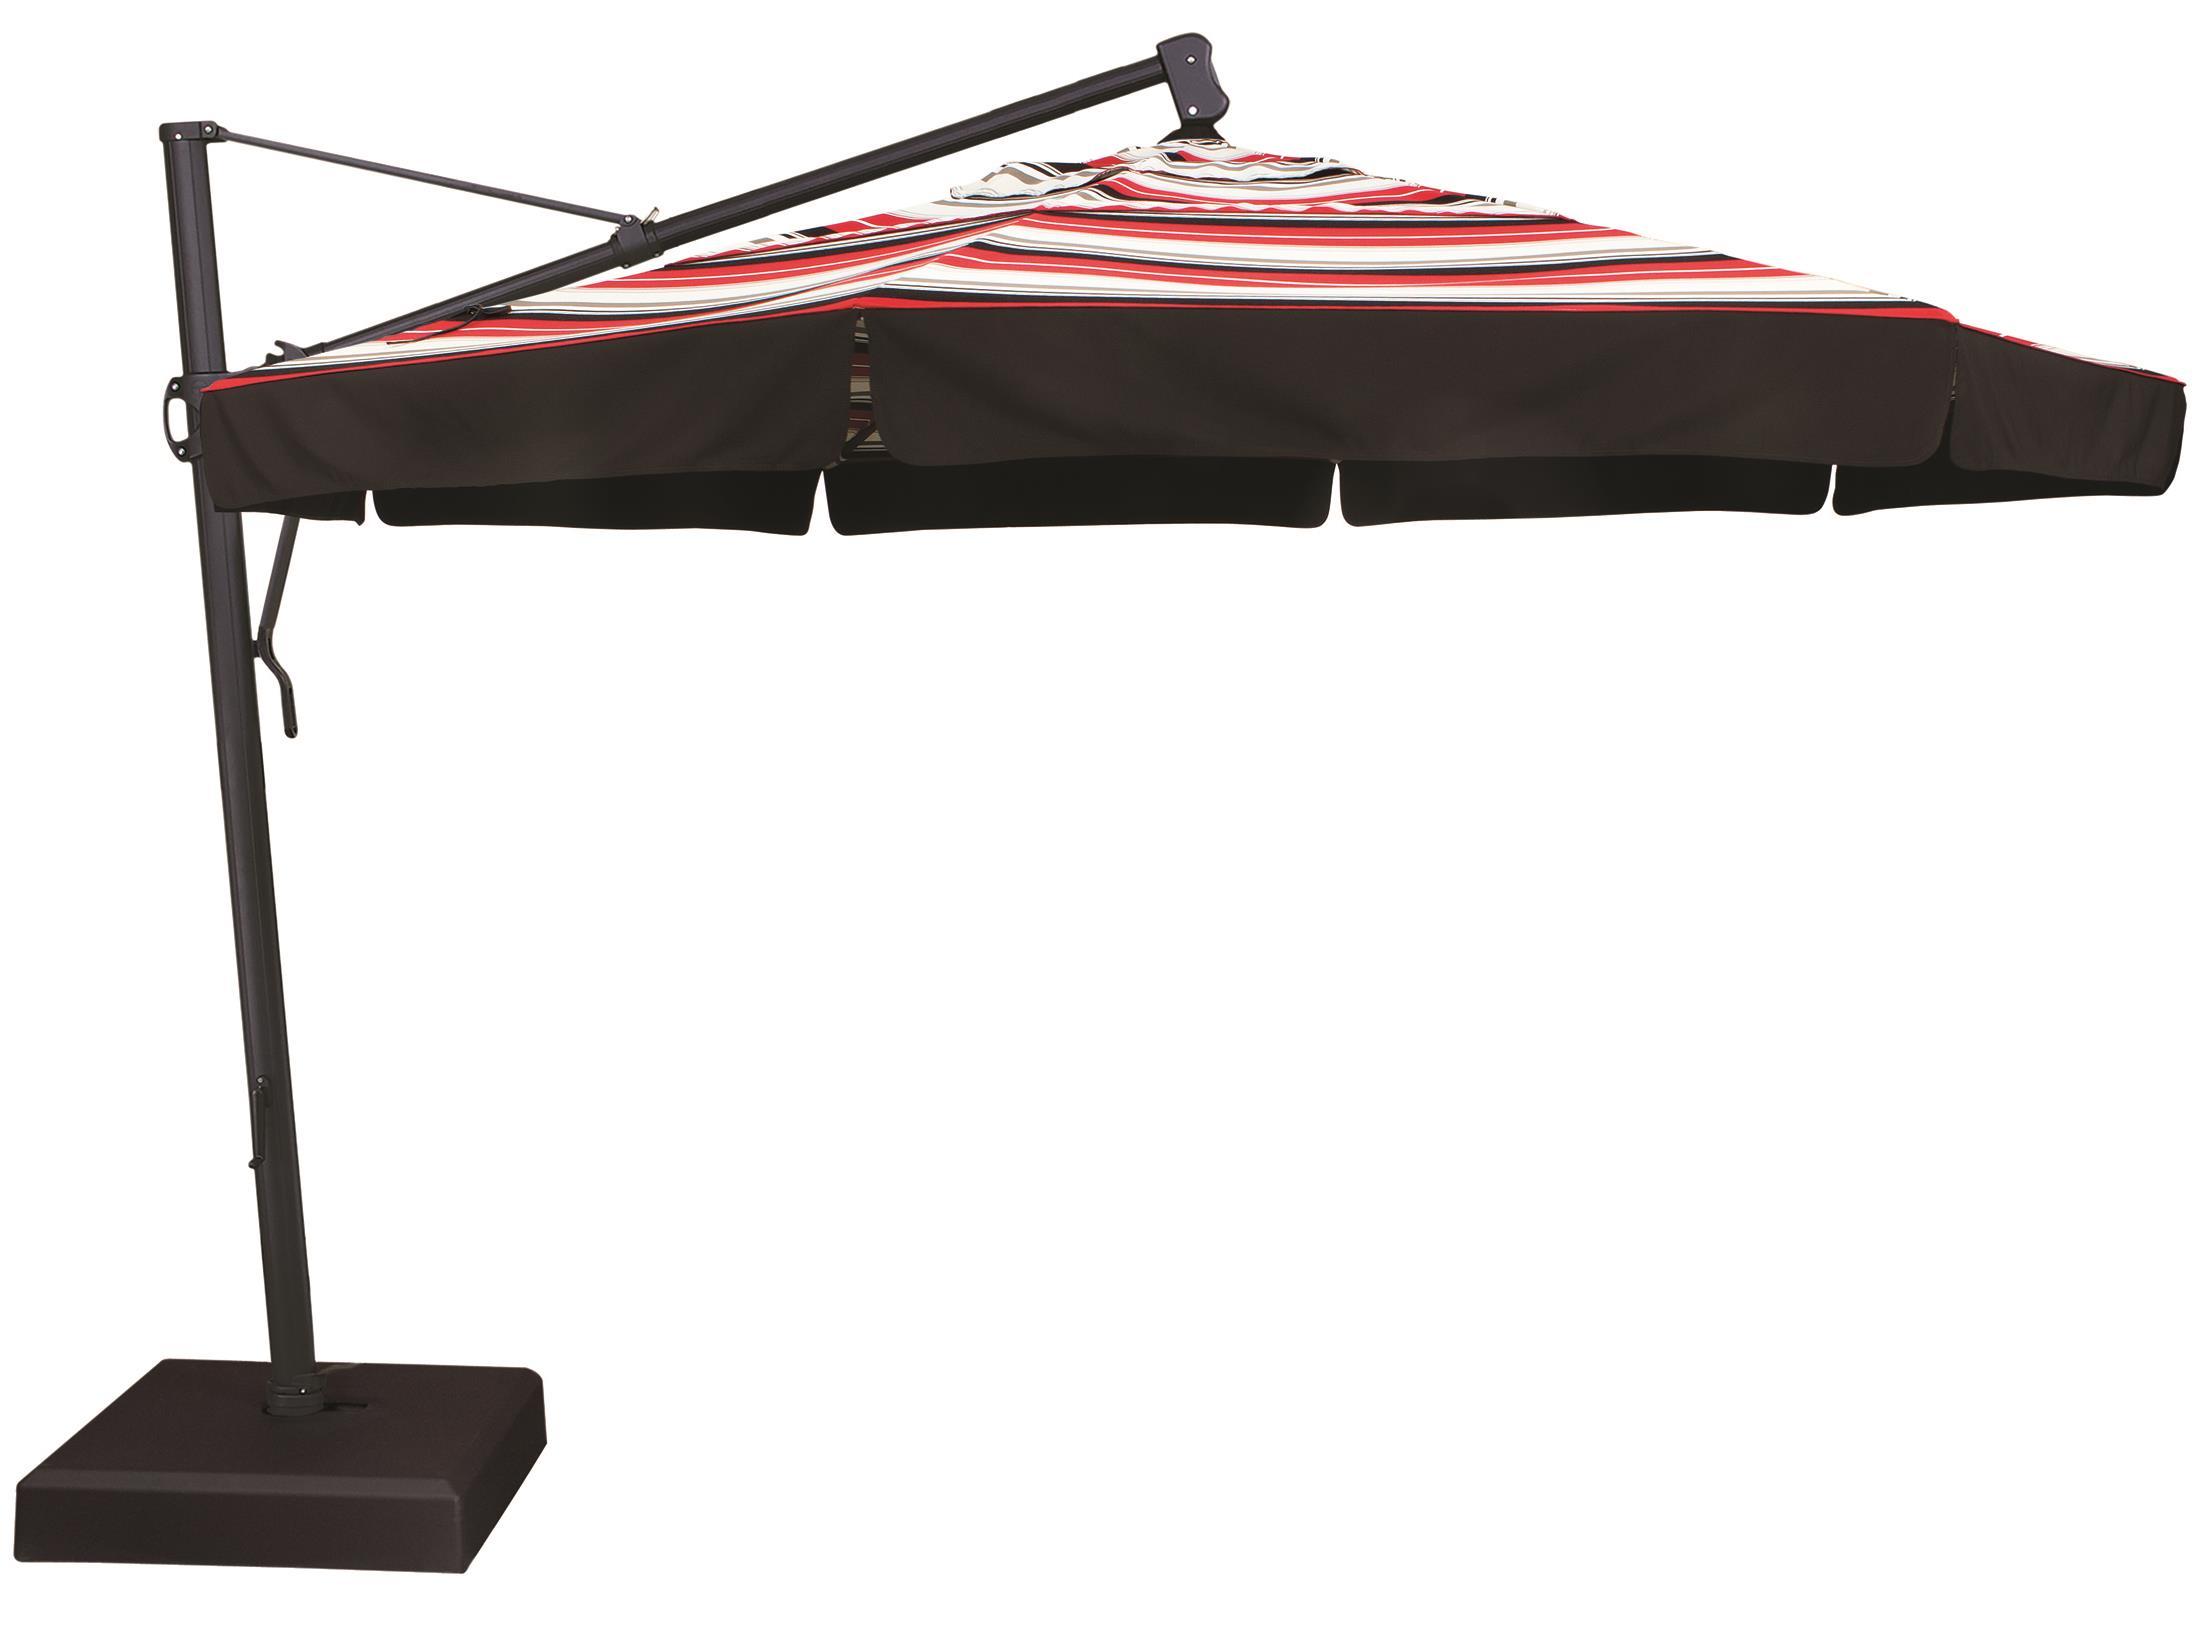 Cantilever Umbrellas 11' Cantilever Umbrella by Treasure Garden at Esprit Decor Home Furnishings